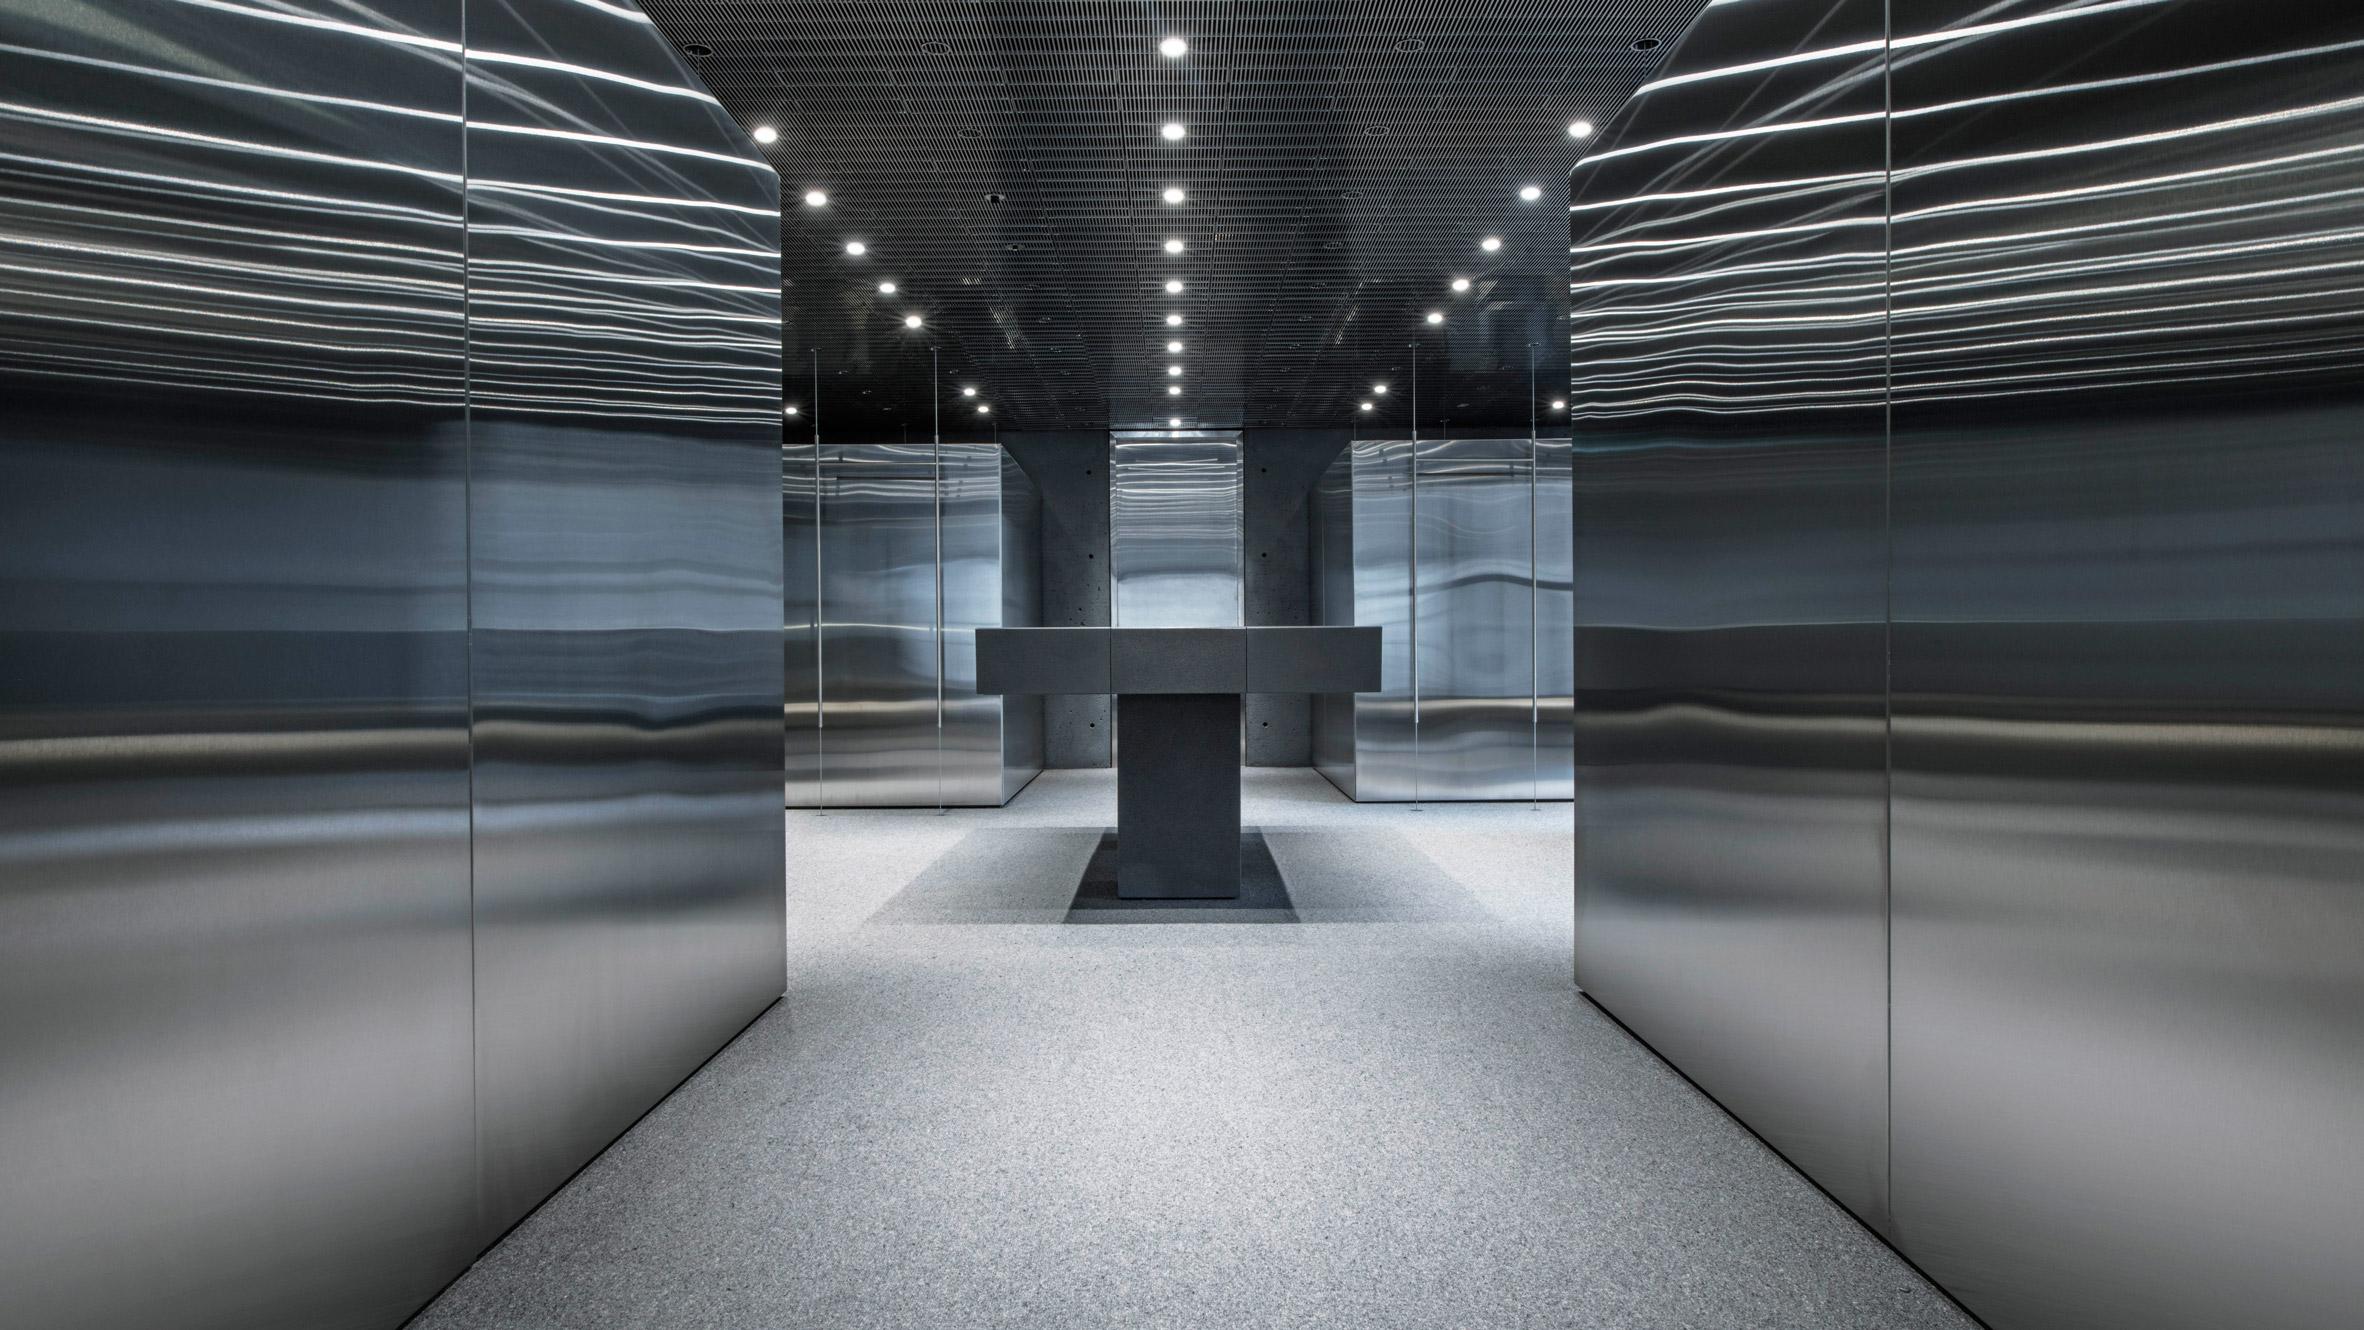 Dezeen's top shop interiors of 2018: Ssense by David Chipperfield Architects